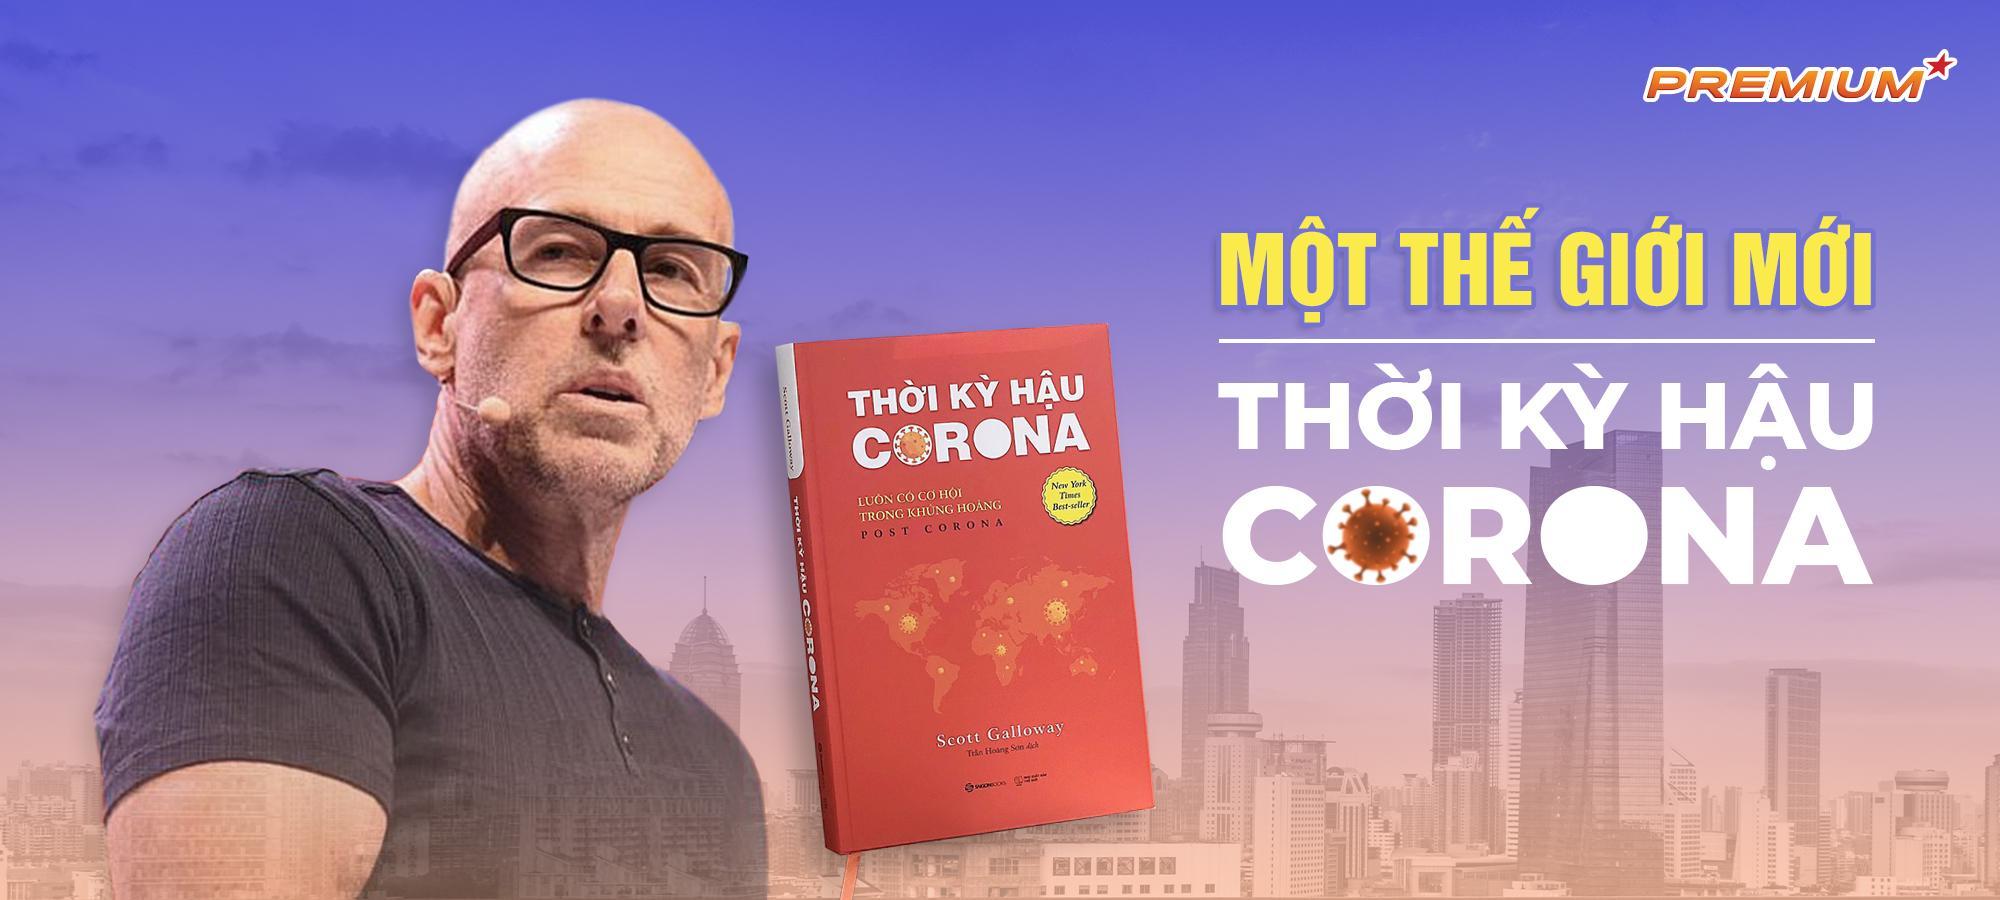 Một thế giới mới thời kỳ hậu Corona